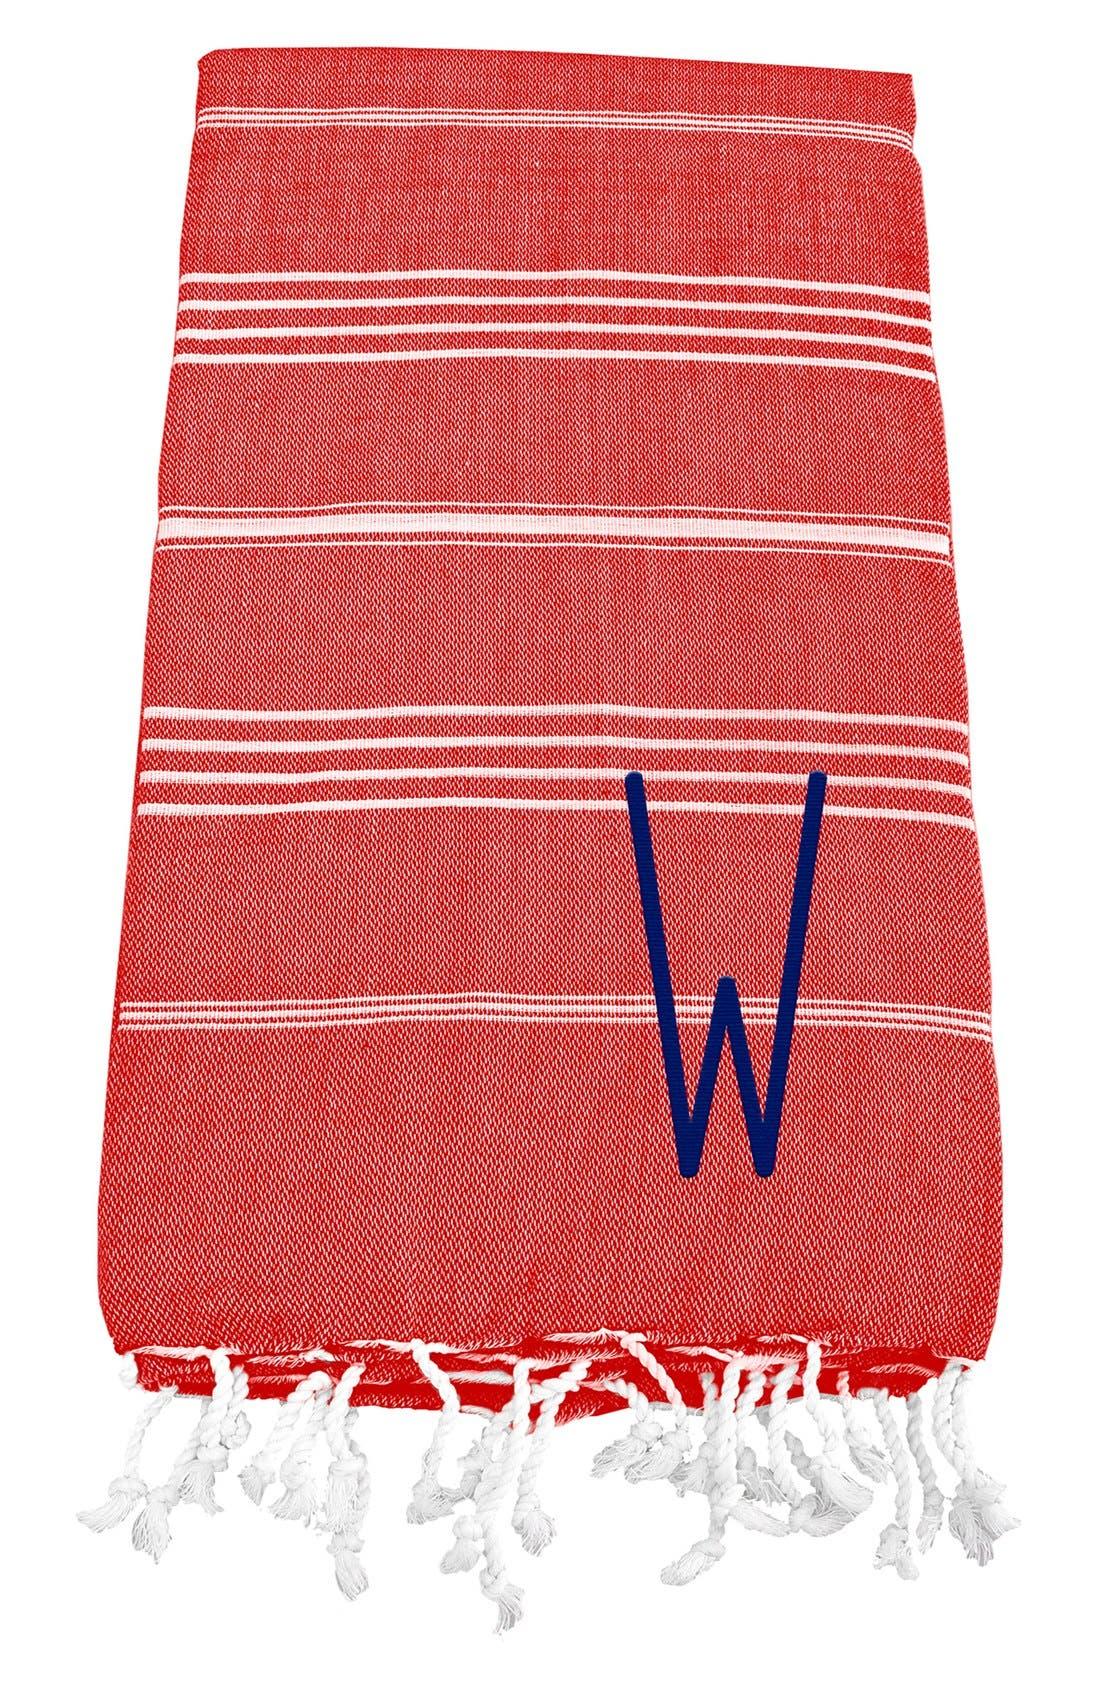 Monogram Turkish Cotton Towel,                             Main thumbnail 132, color,